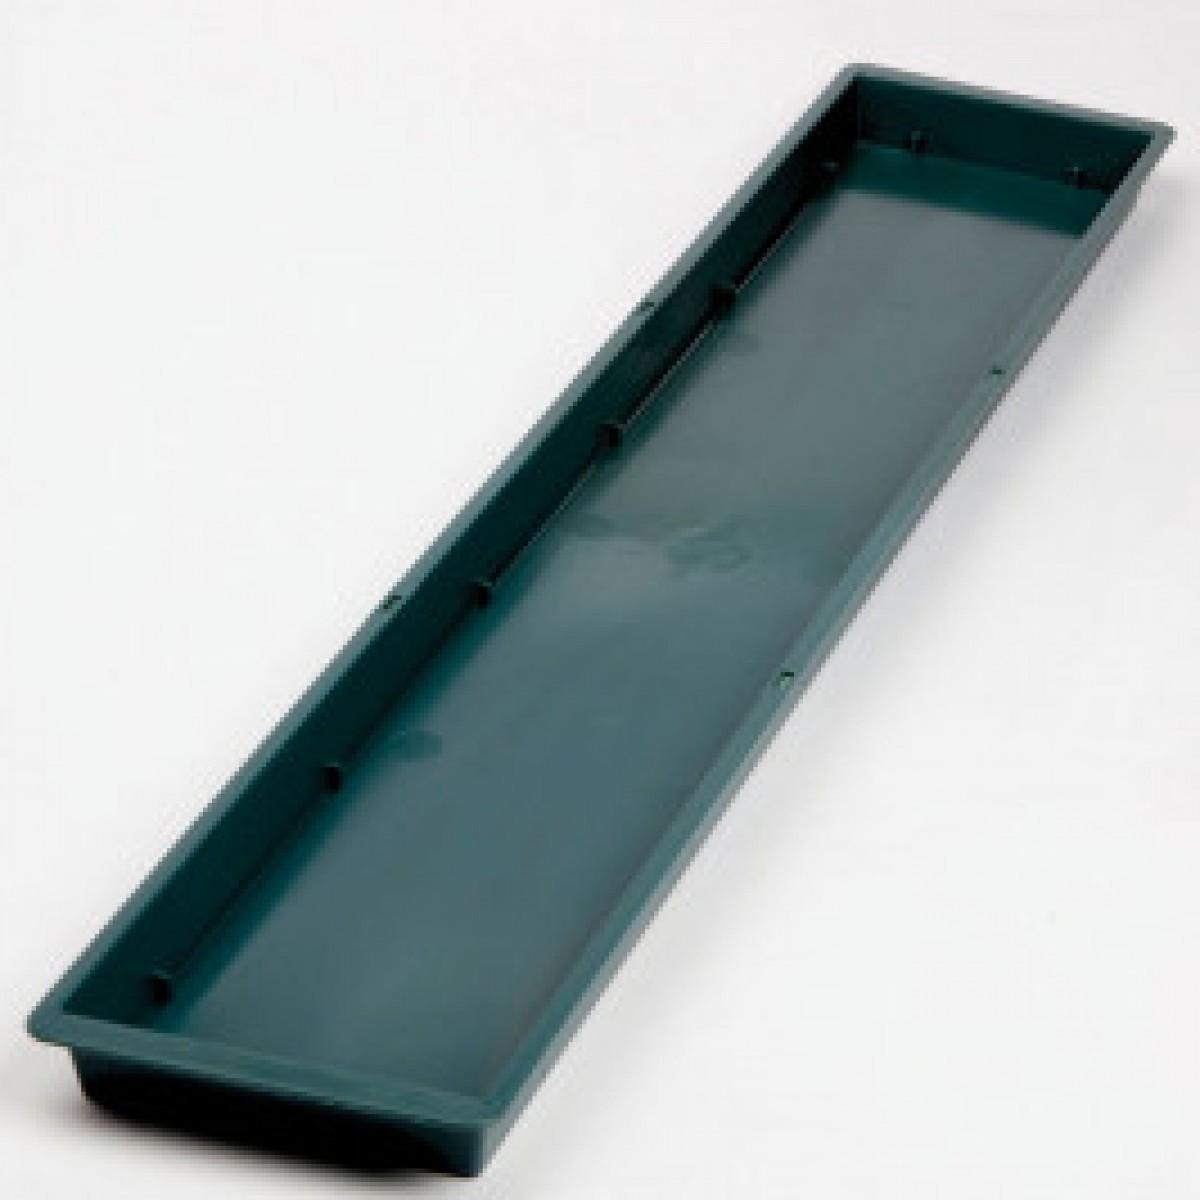 Double Brick Plastic Tray Green - 10 No